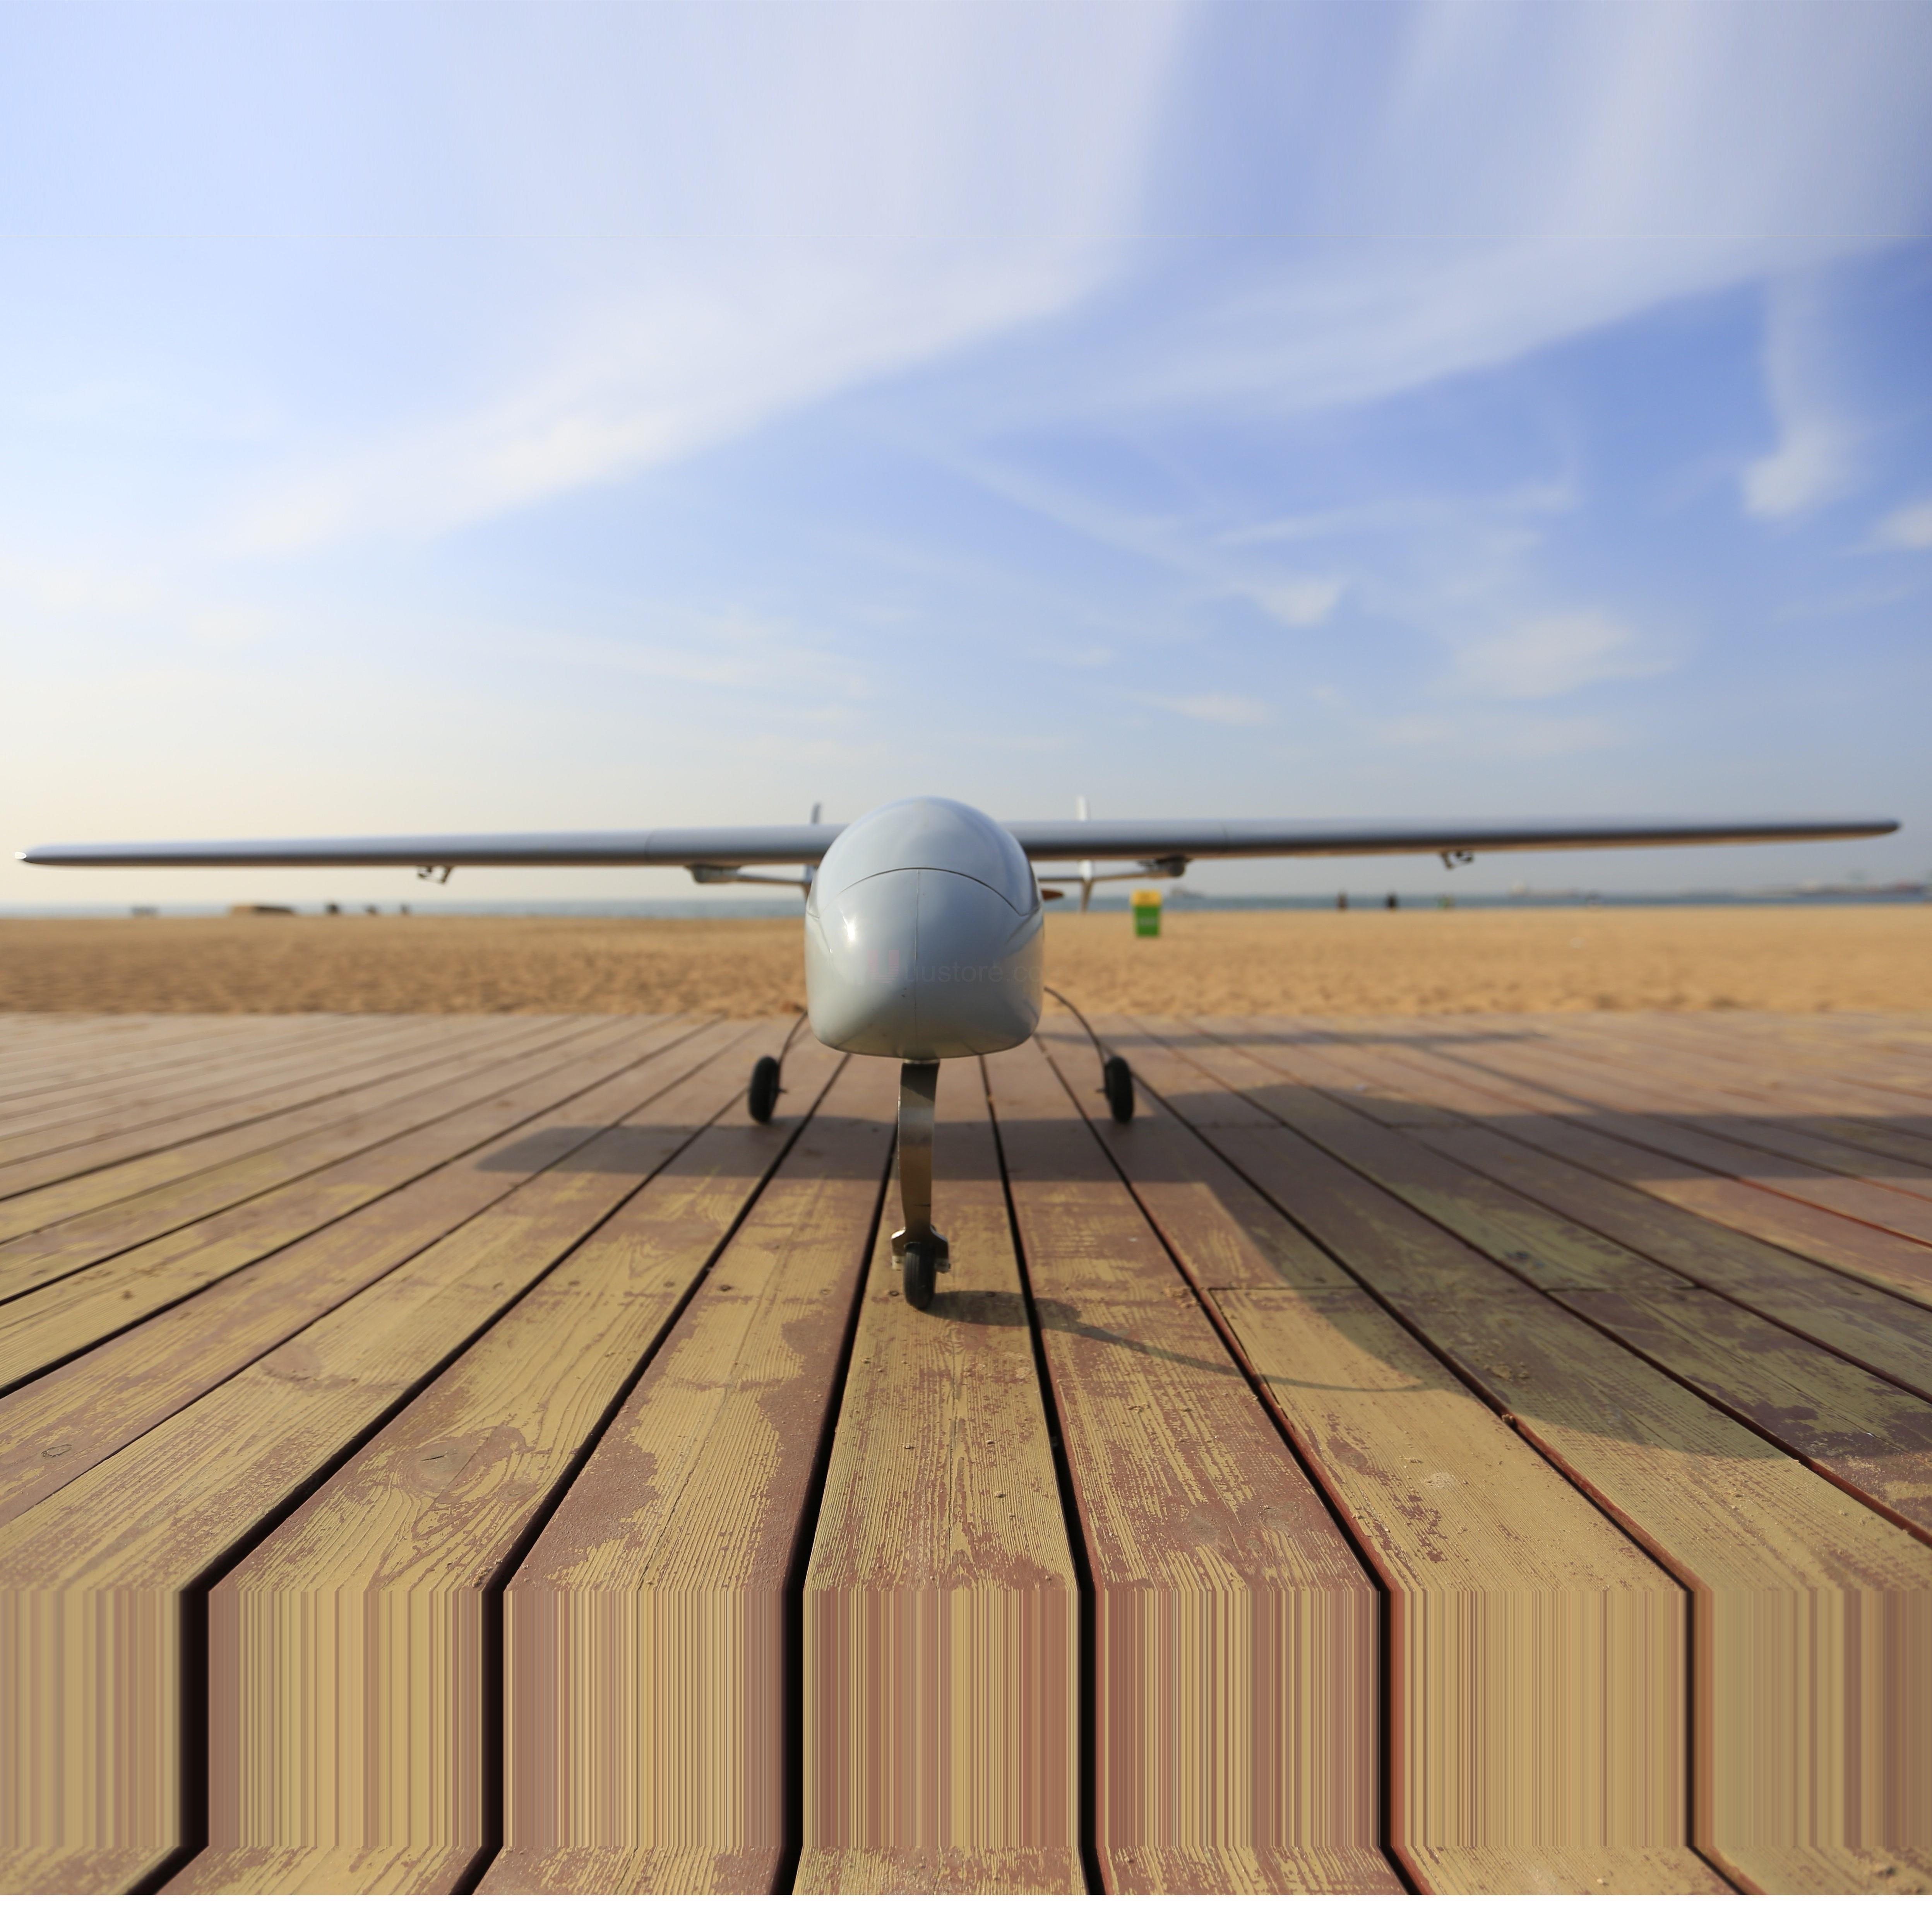 RC Airplane Kit Plane UAV Mini Skyeye 2.6m 2600mm T tail platform carbon fiber Tail Suit Requirement 30-35cc engine  model aircraft